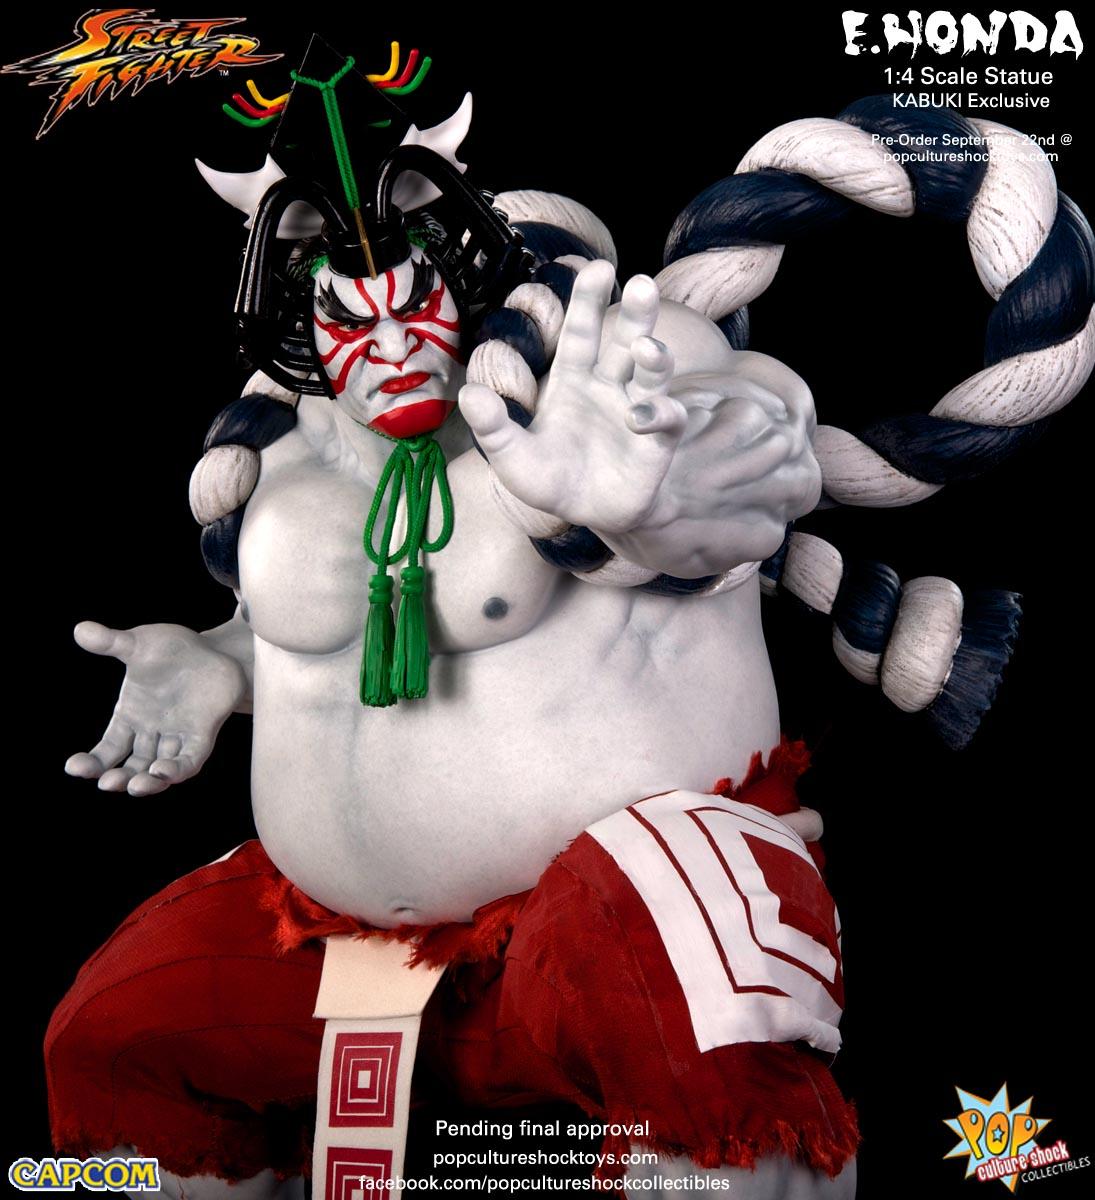 [Pop Culture Shock] Street Fighter: E. Honda 1/4 Statue - Página 3 Street-Fighter-E.-Honda-Kabuki-Statue-025